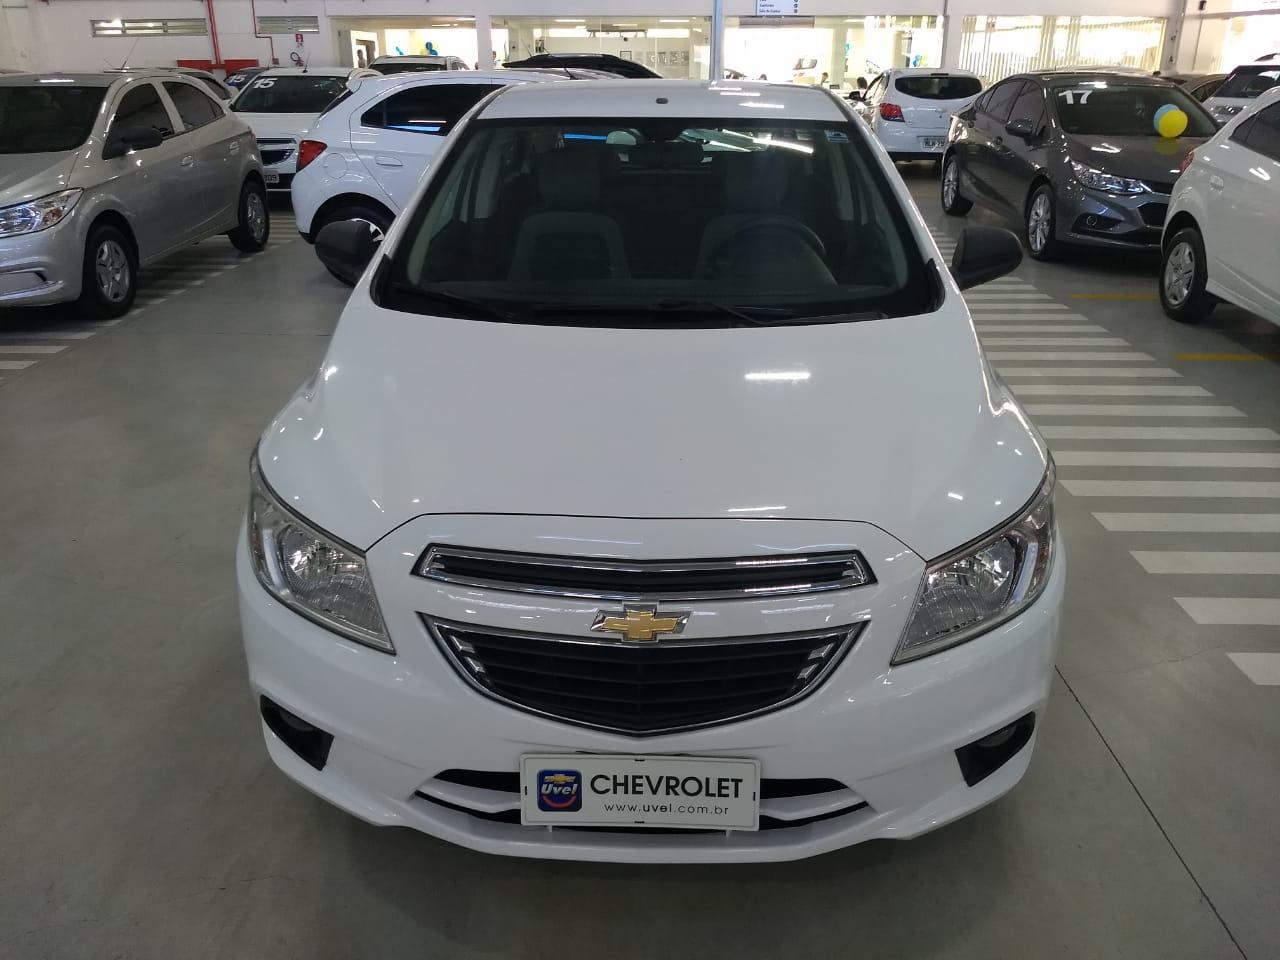 Chevrolet Onix LT 1.0L 2015